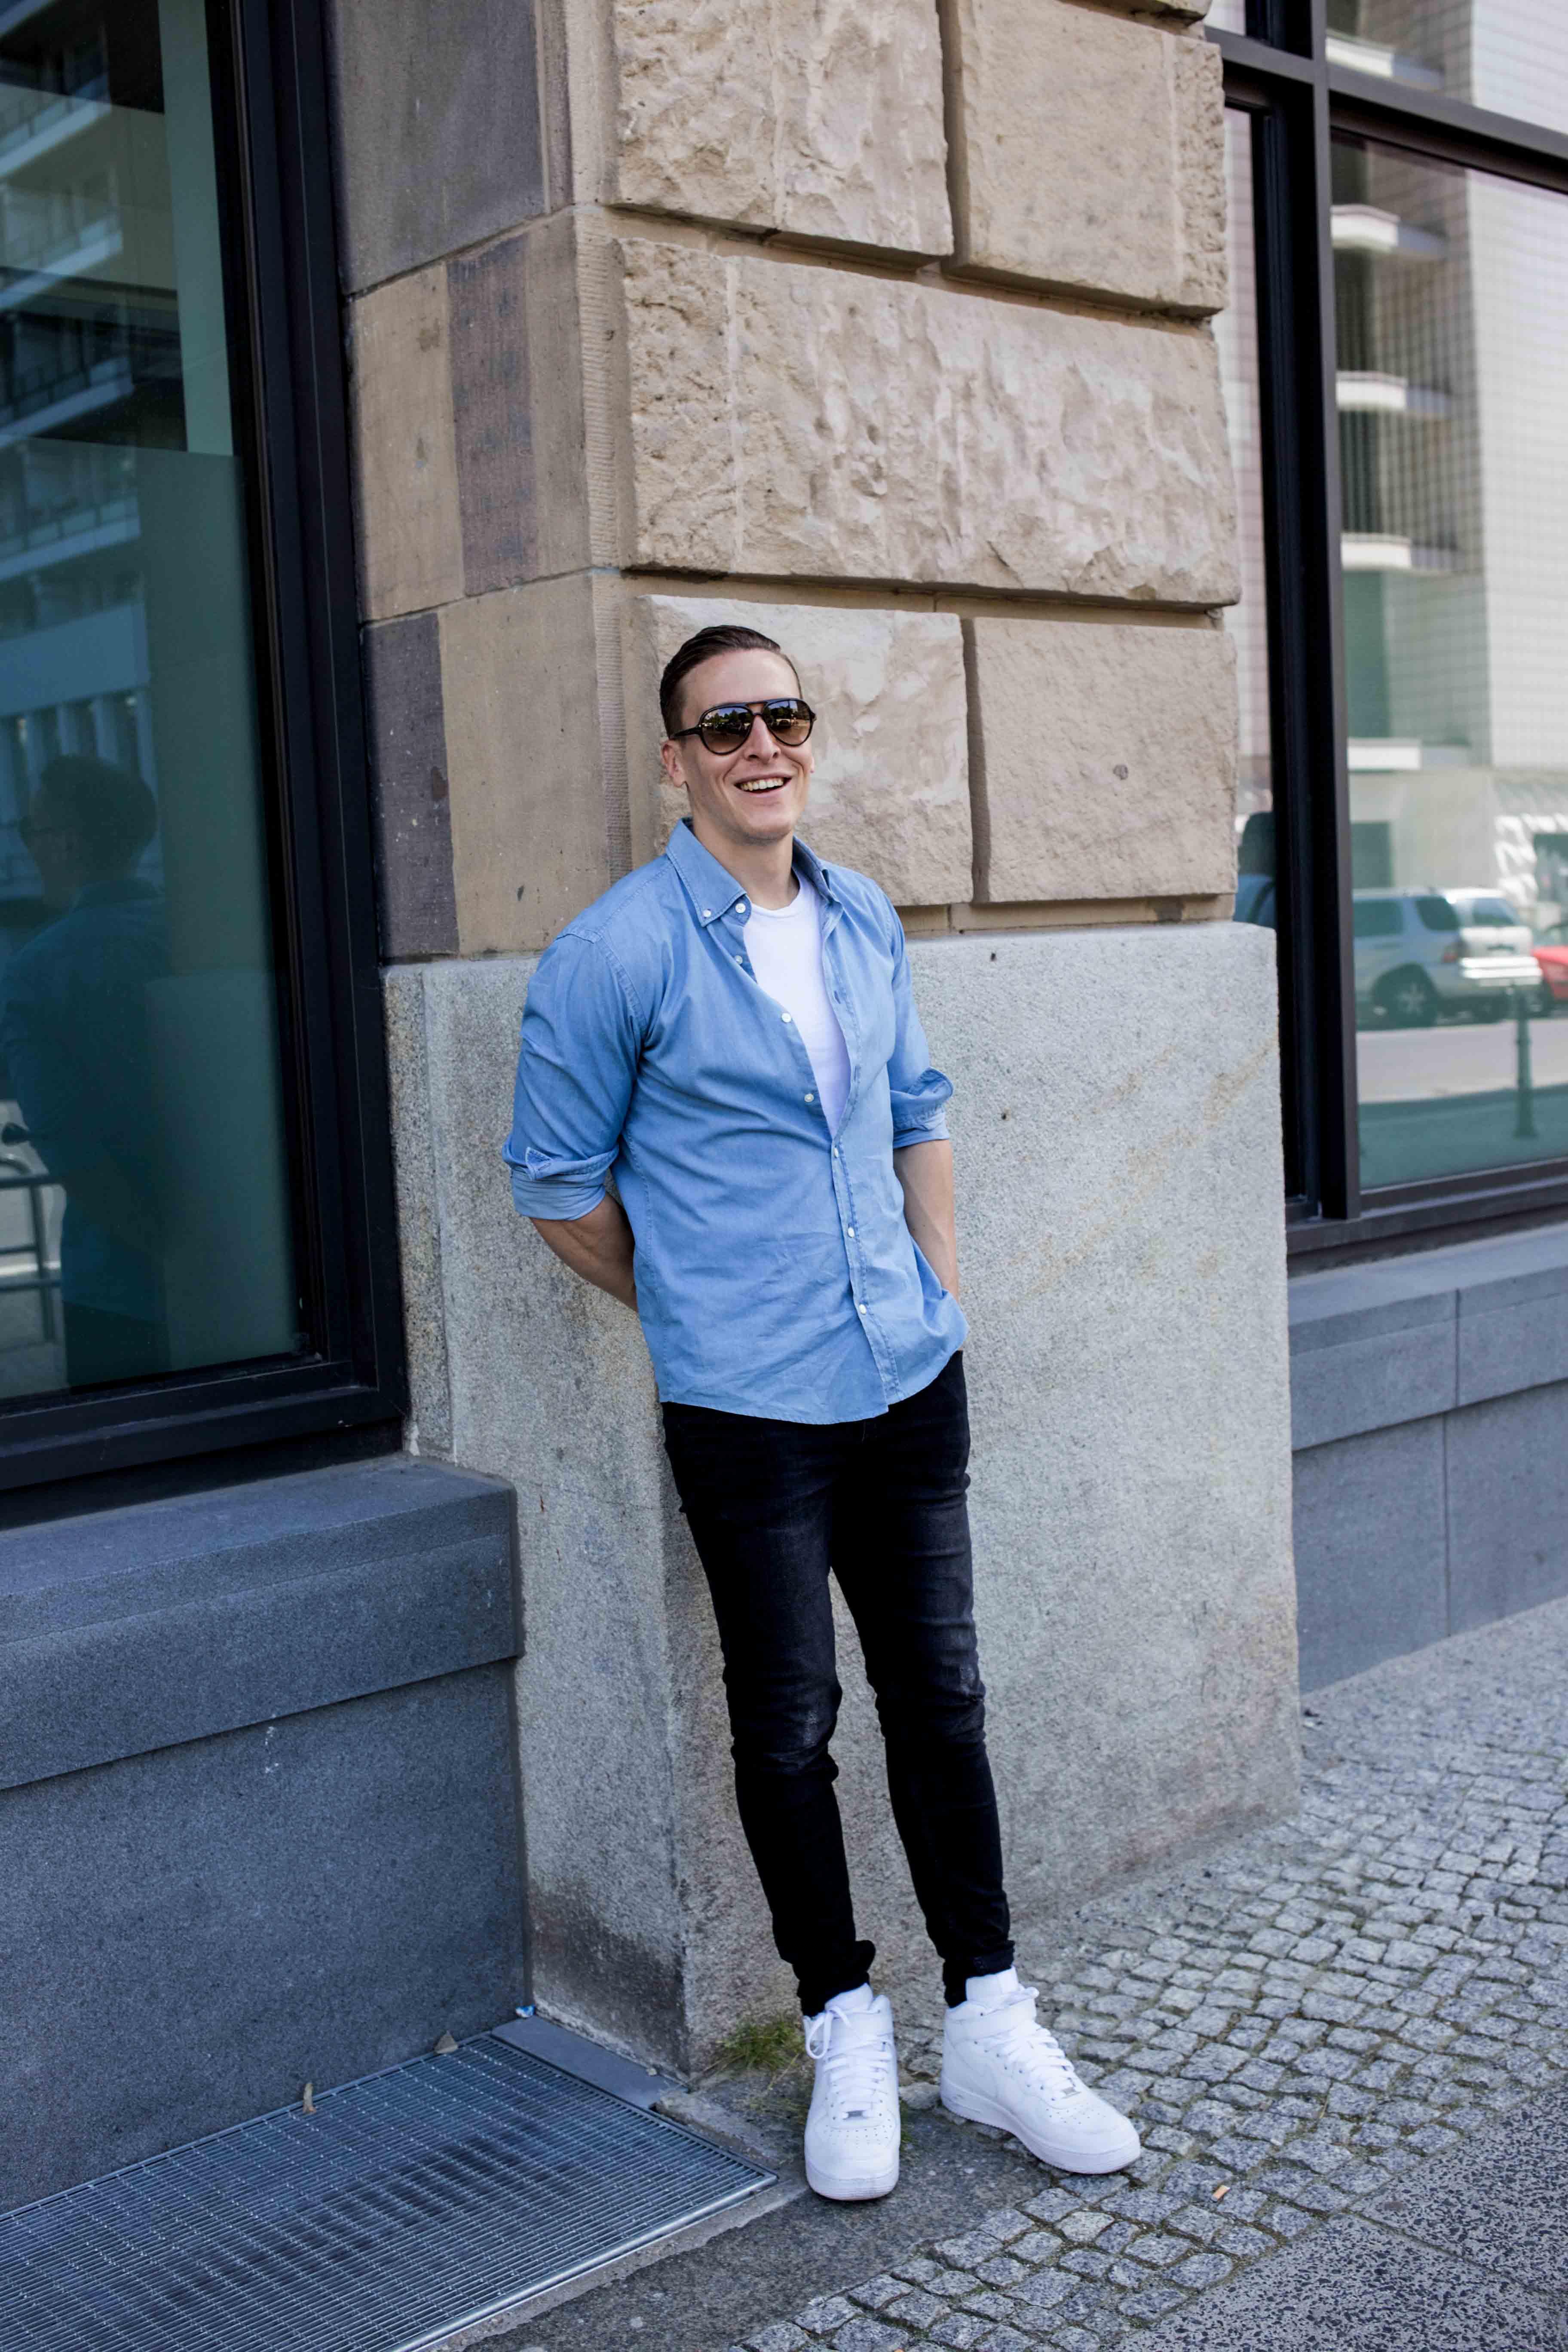 hellblaues-freizeitshirt-rayban-cats-destroyed-skinny-jeans-männerblog-menfashion-fashionblog_7781